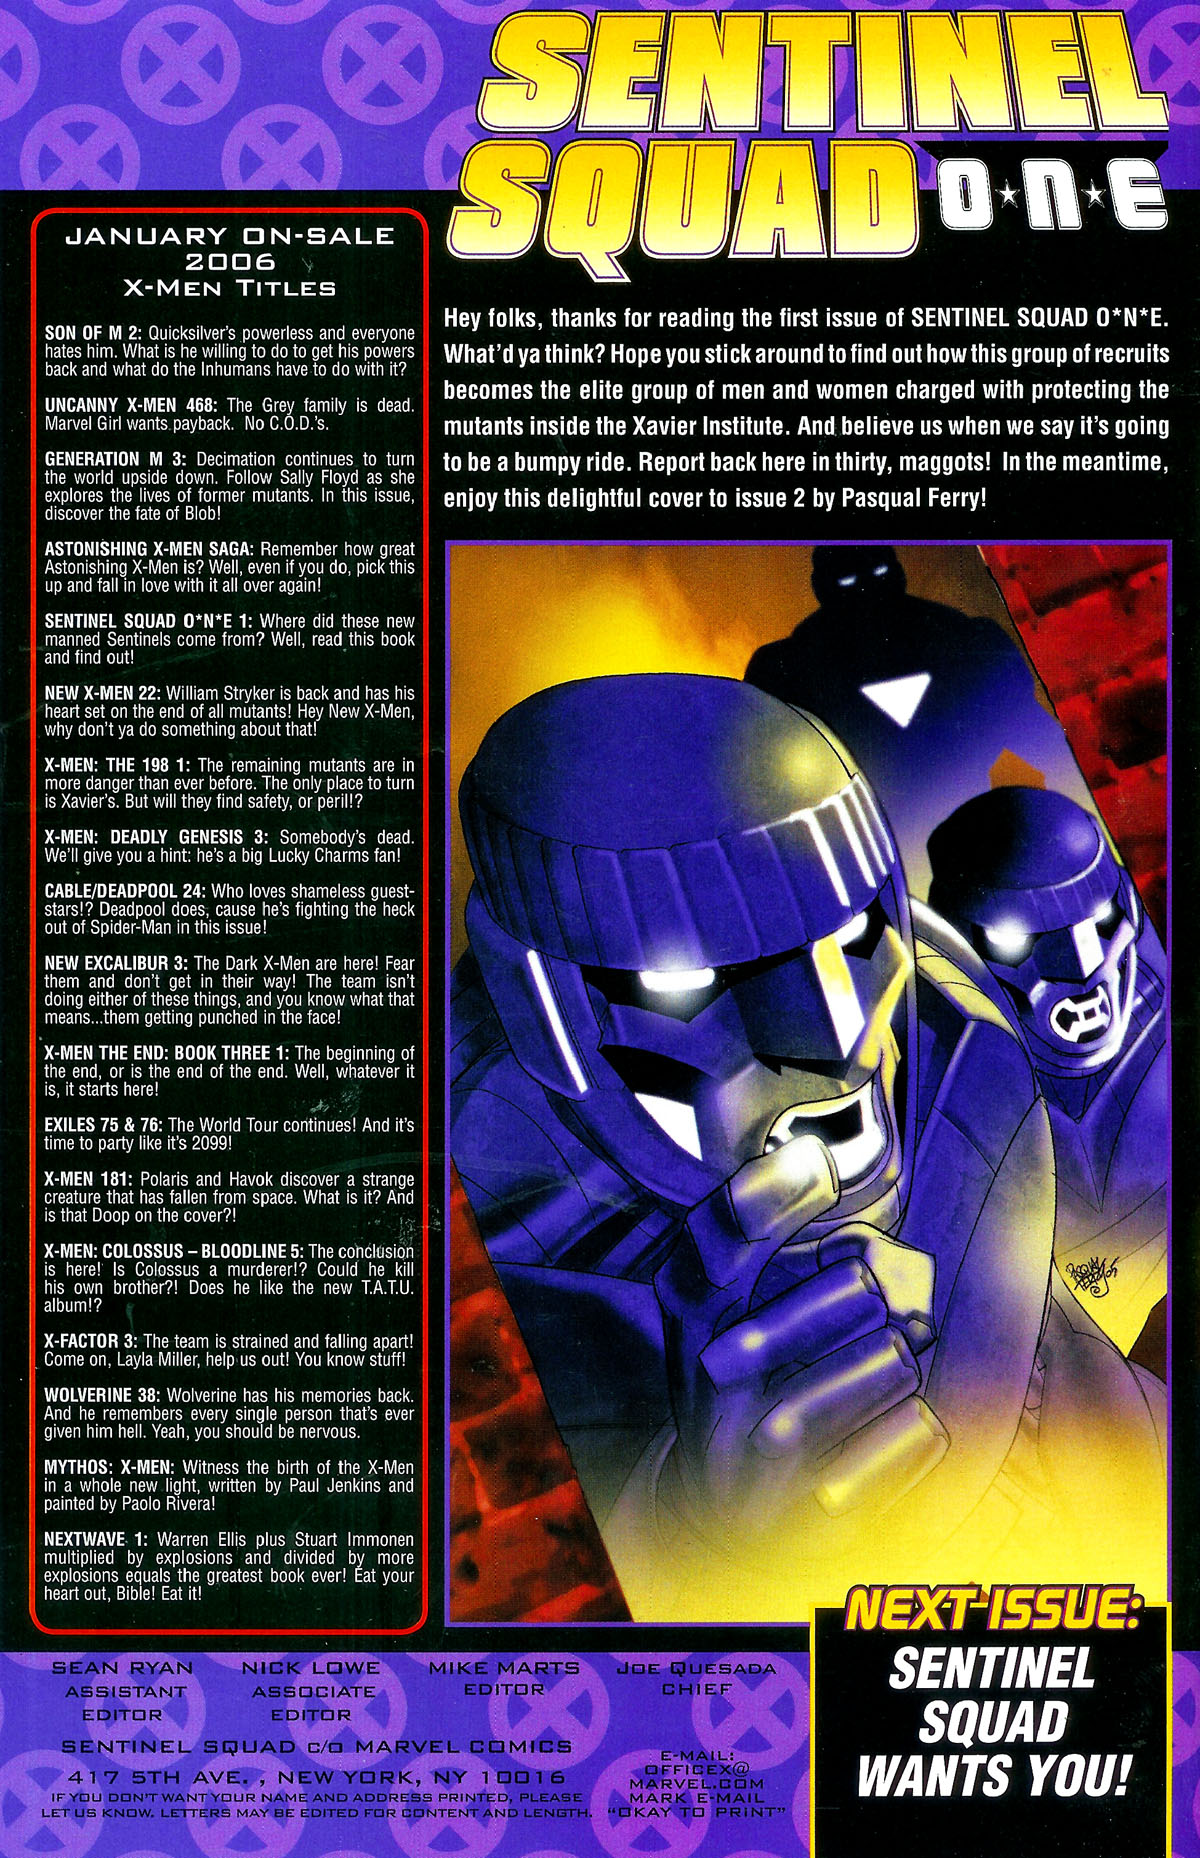 Read online Sentinel Squad O*N*E comic -  Issue #1 - 23